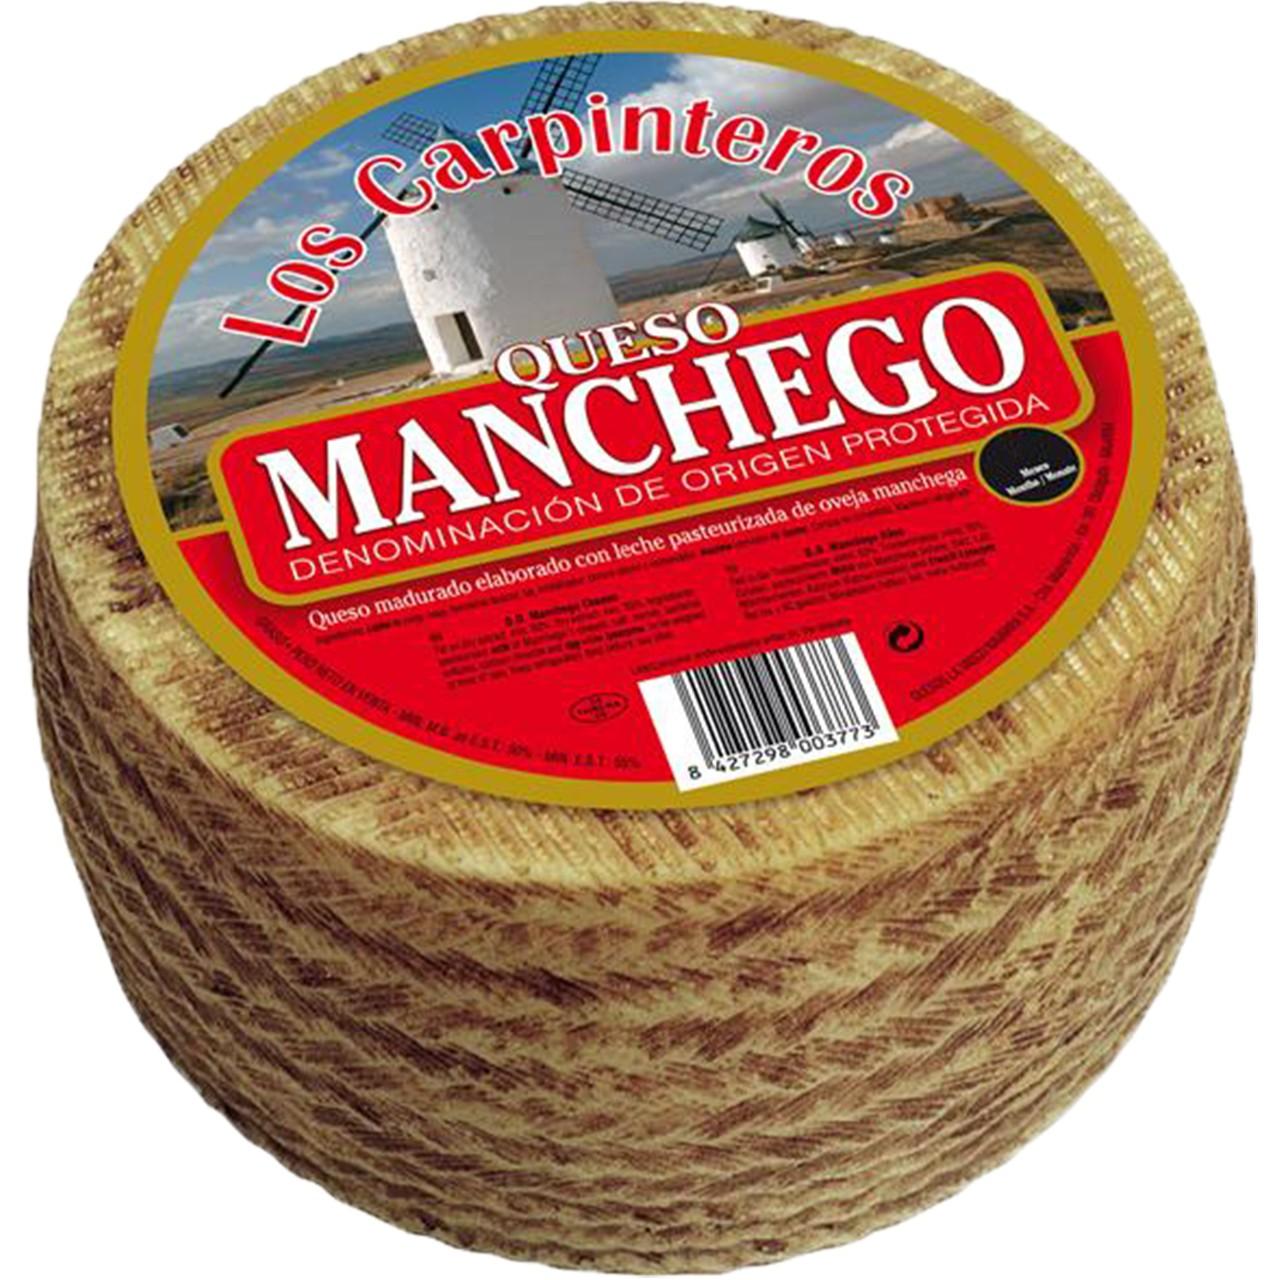 Schafskäse Original Manchego D.O 1 Kg - Queso Manchego - Spanien